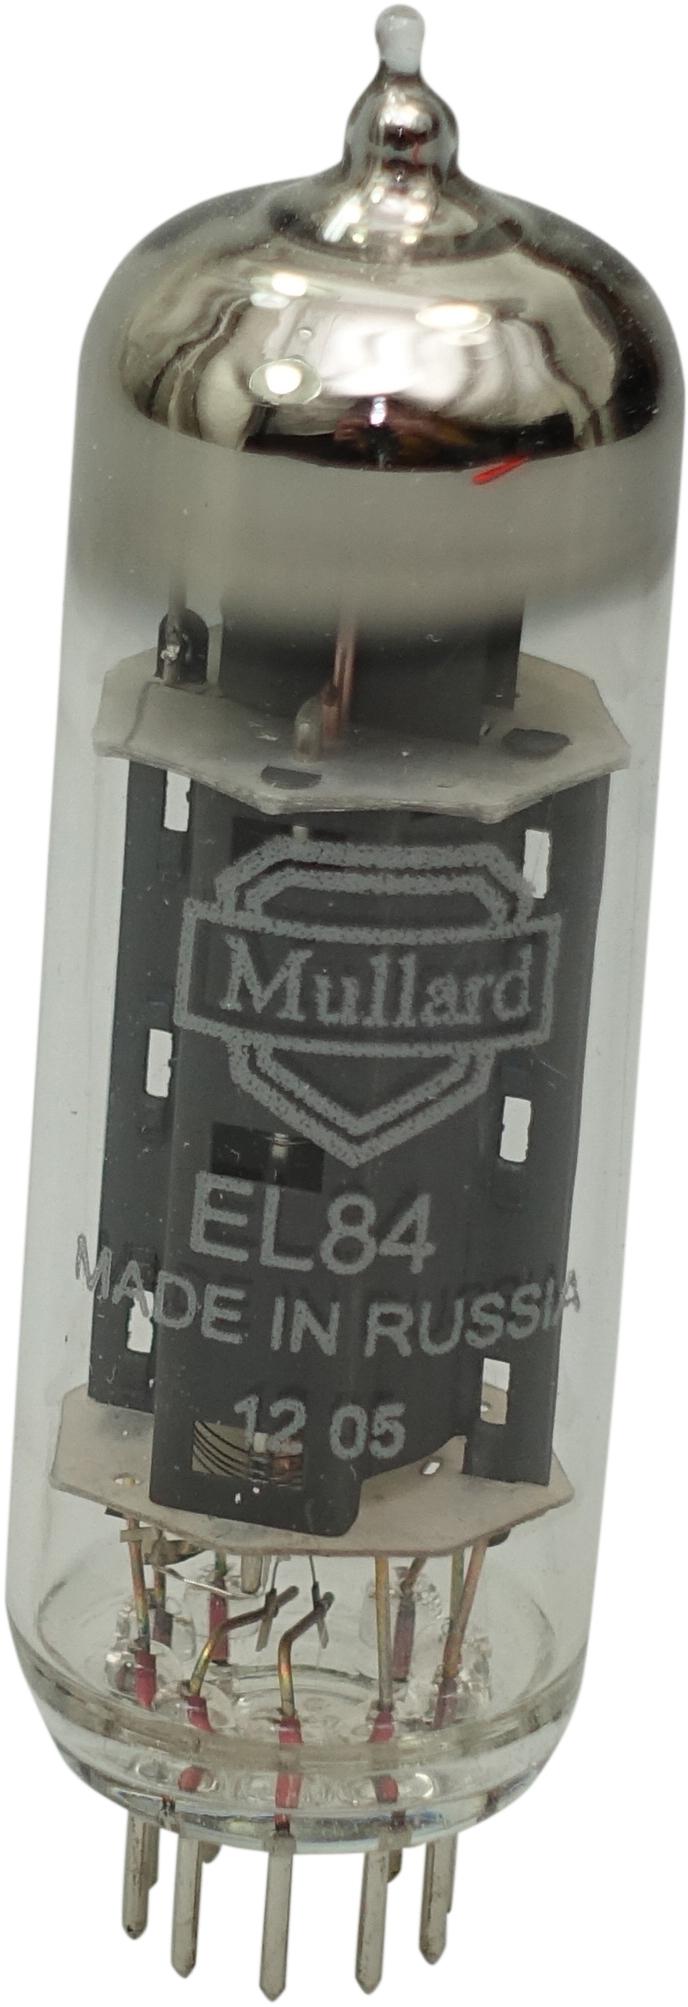 EL84 Mullard